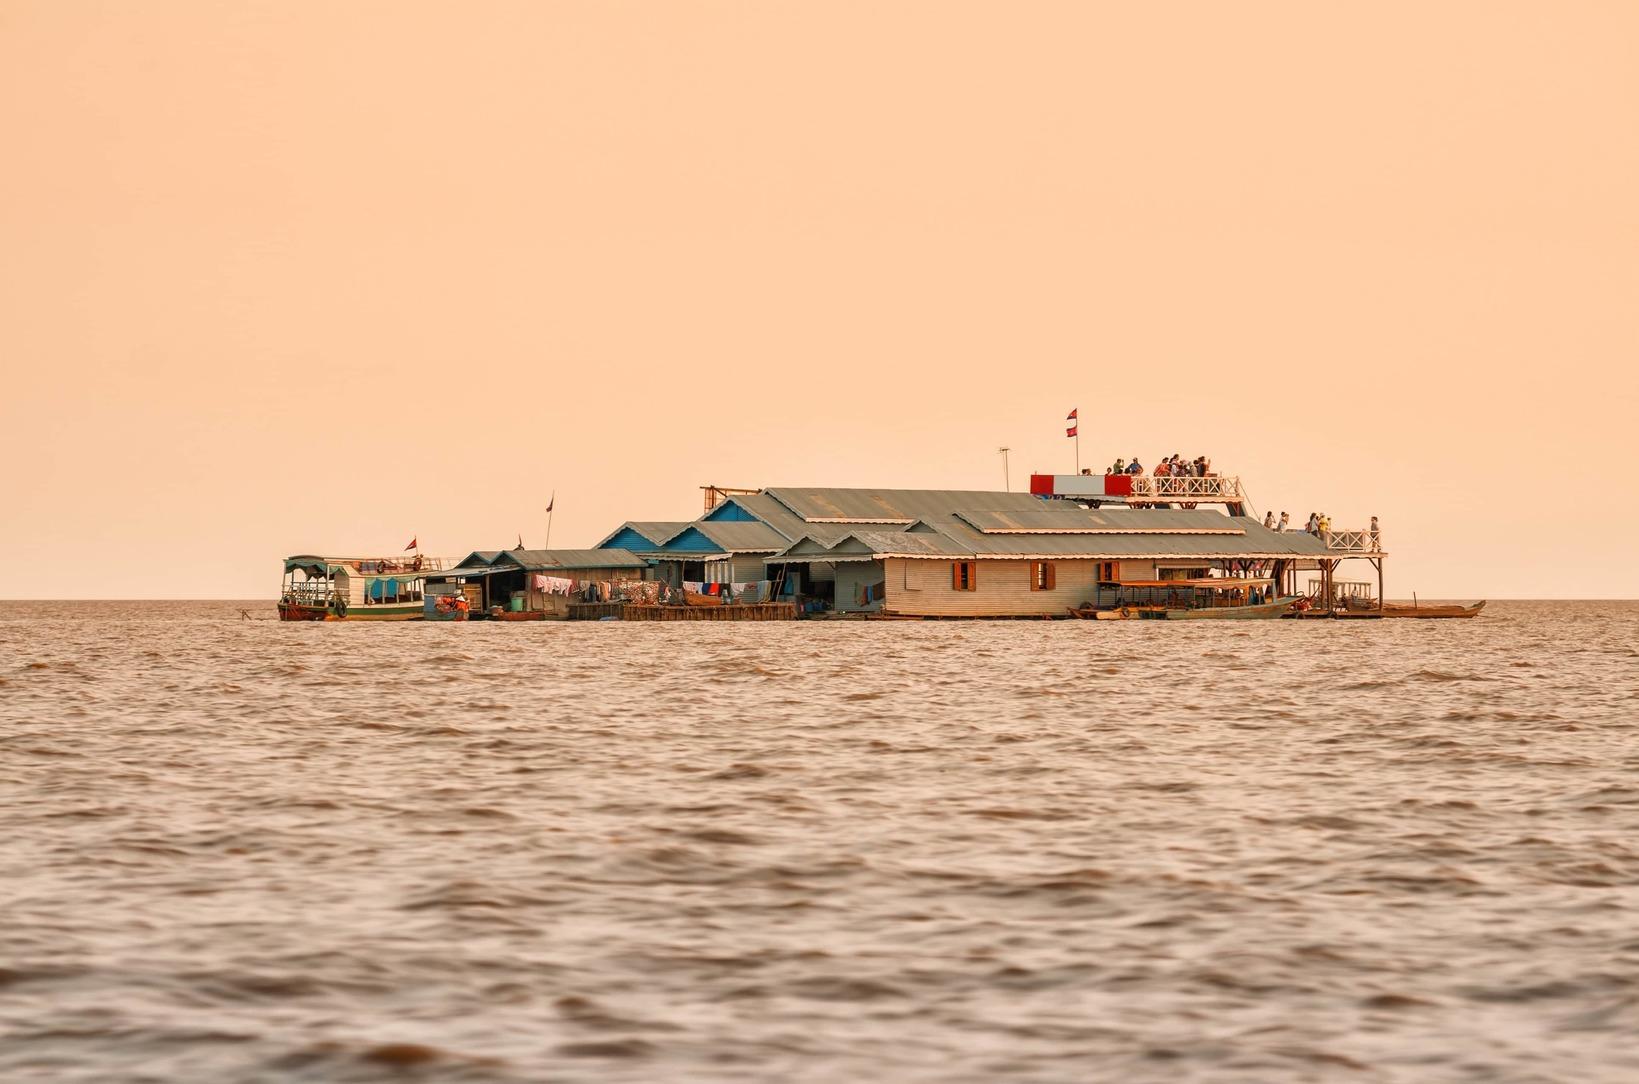 Tonle Sap Lake Tour With Vacation Rental Siem Reap